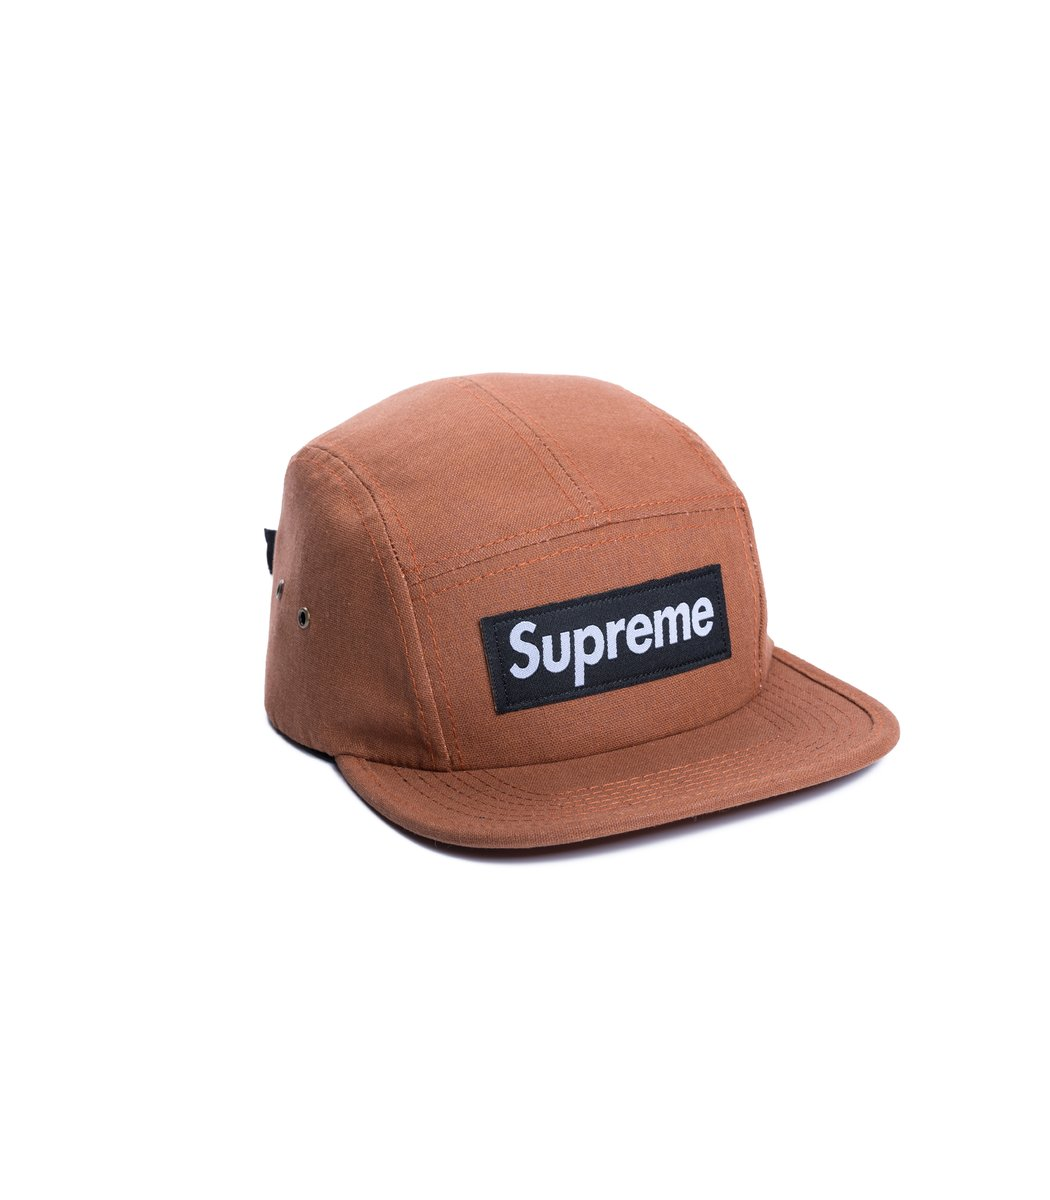 Кепка Supreme Classic (коричневый)